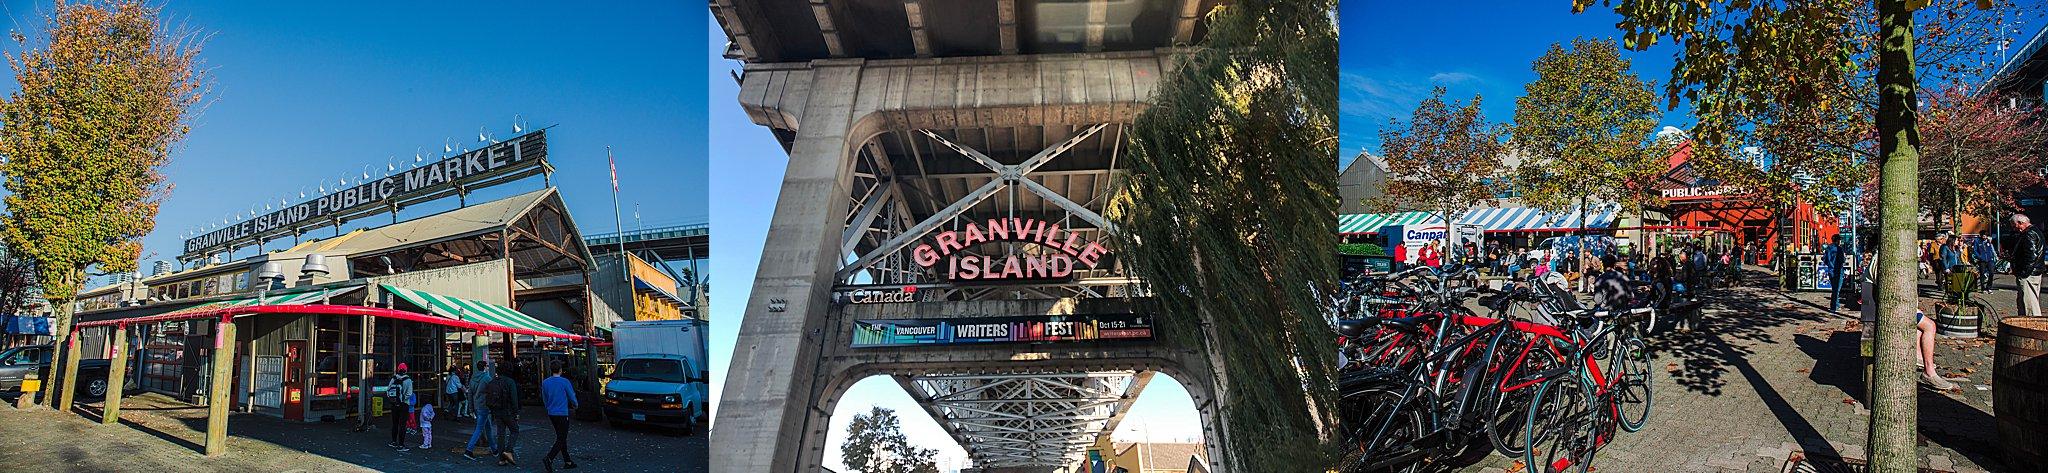 vancouver, british columbia, granville island, granville island public market, prospect point, stanley park, deep cove